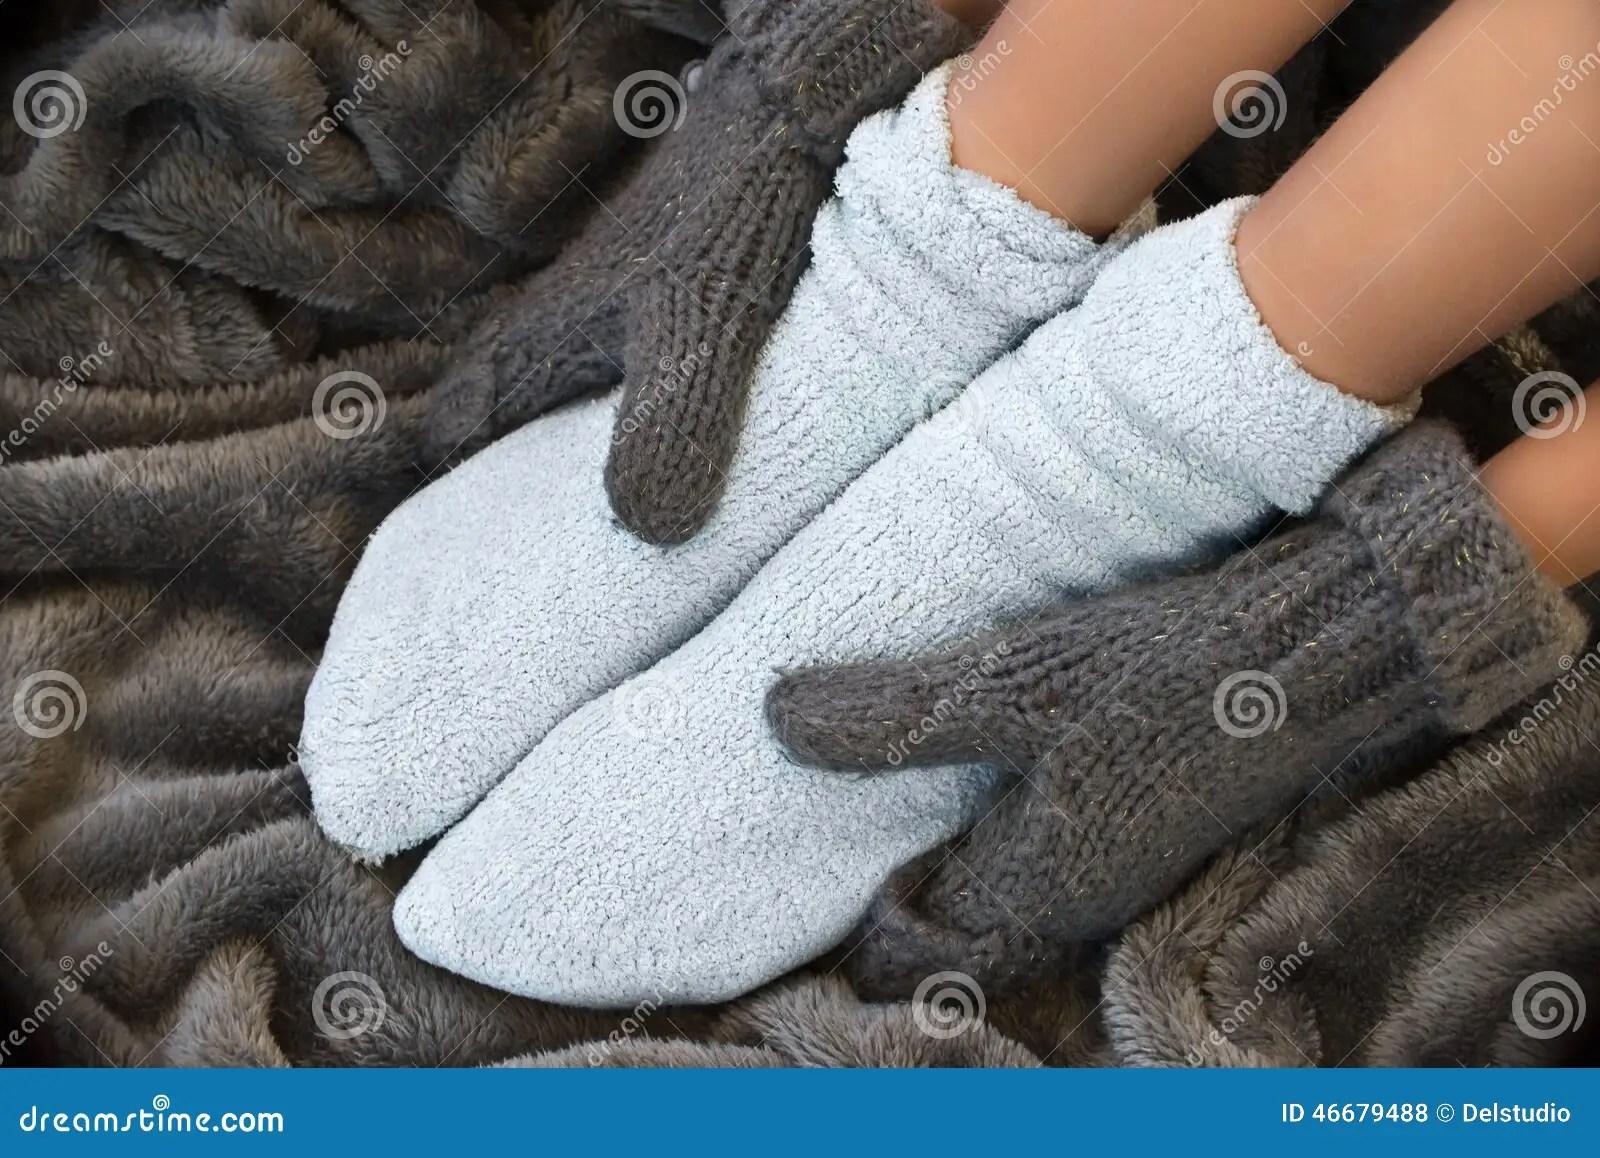 Feet In Comfortable And Warm Woolen Socks Stock Photo